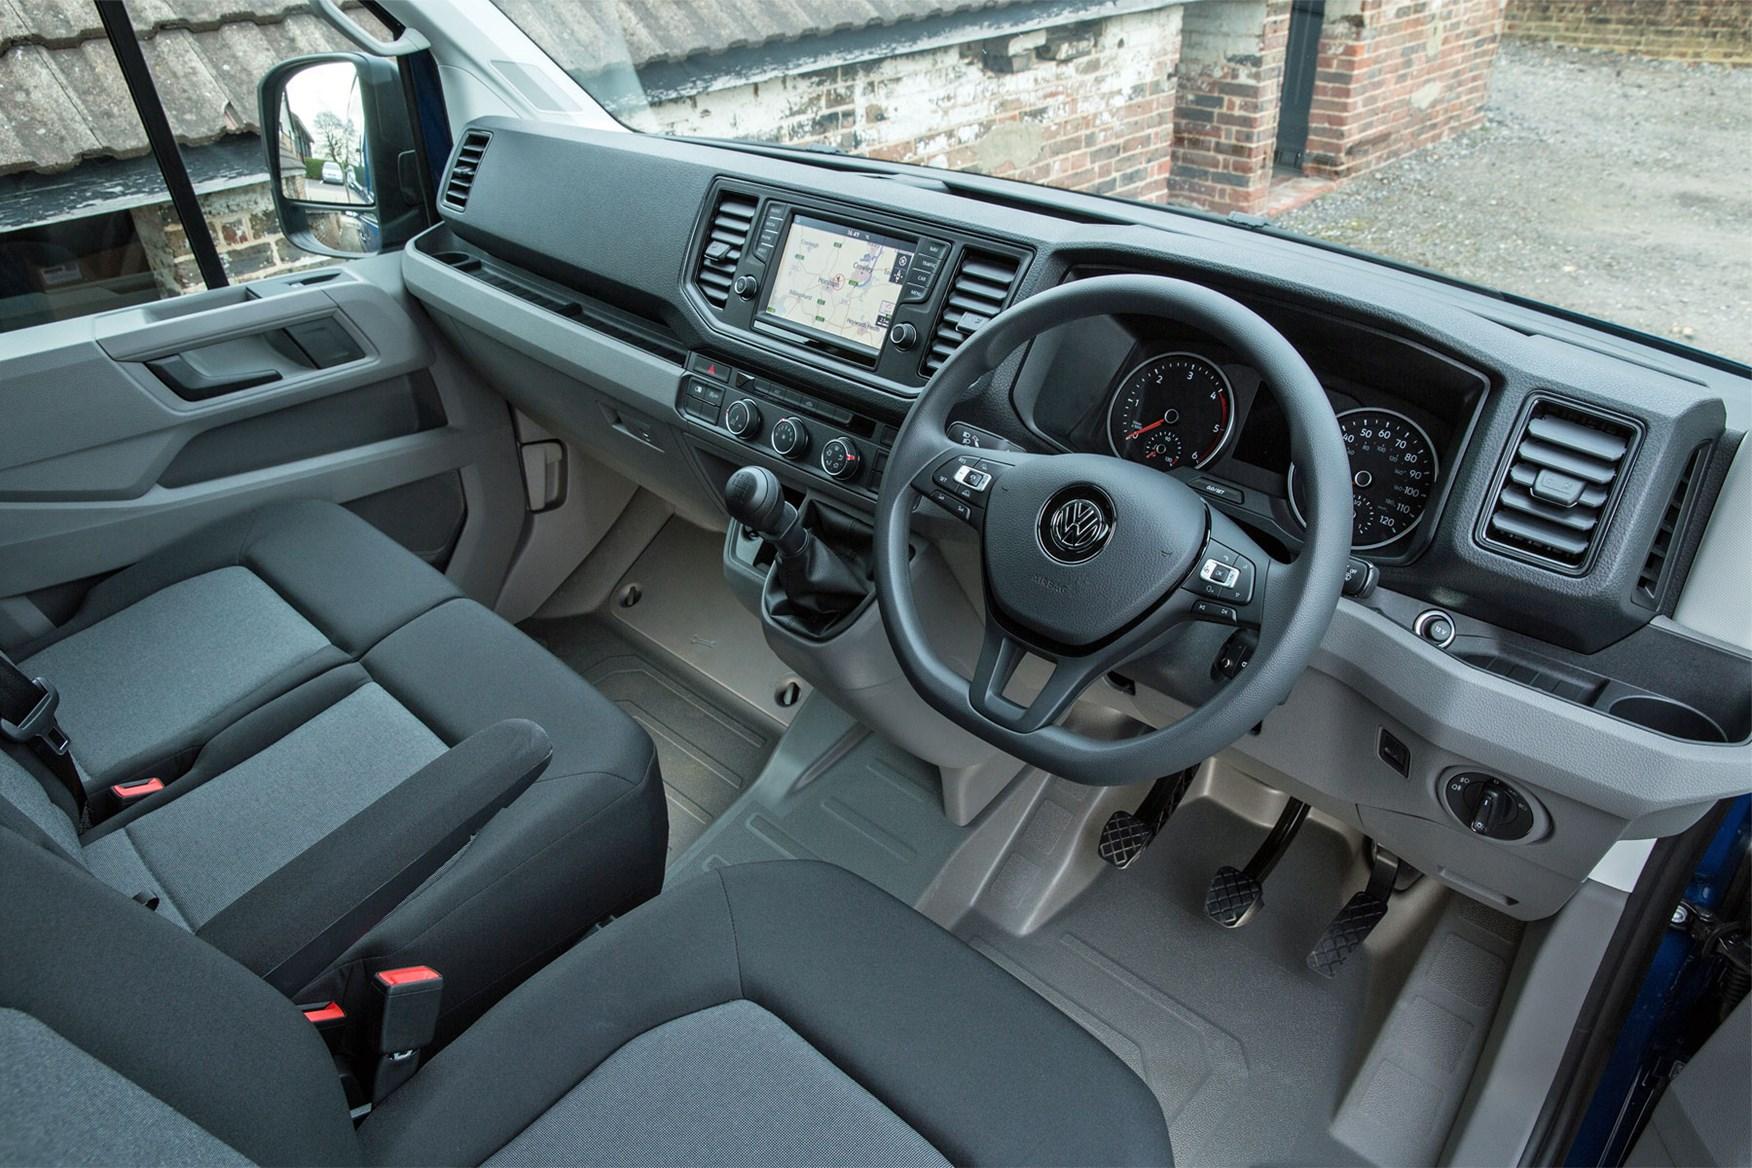 VW Crafter (2017-on) cab interior